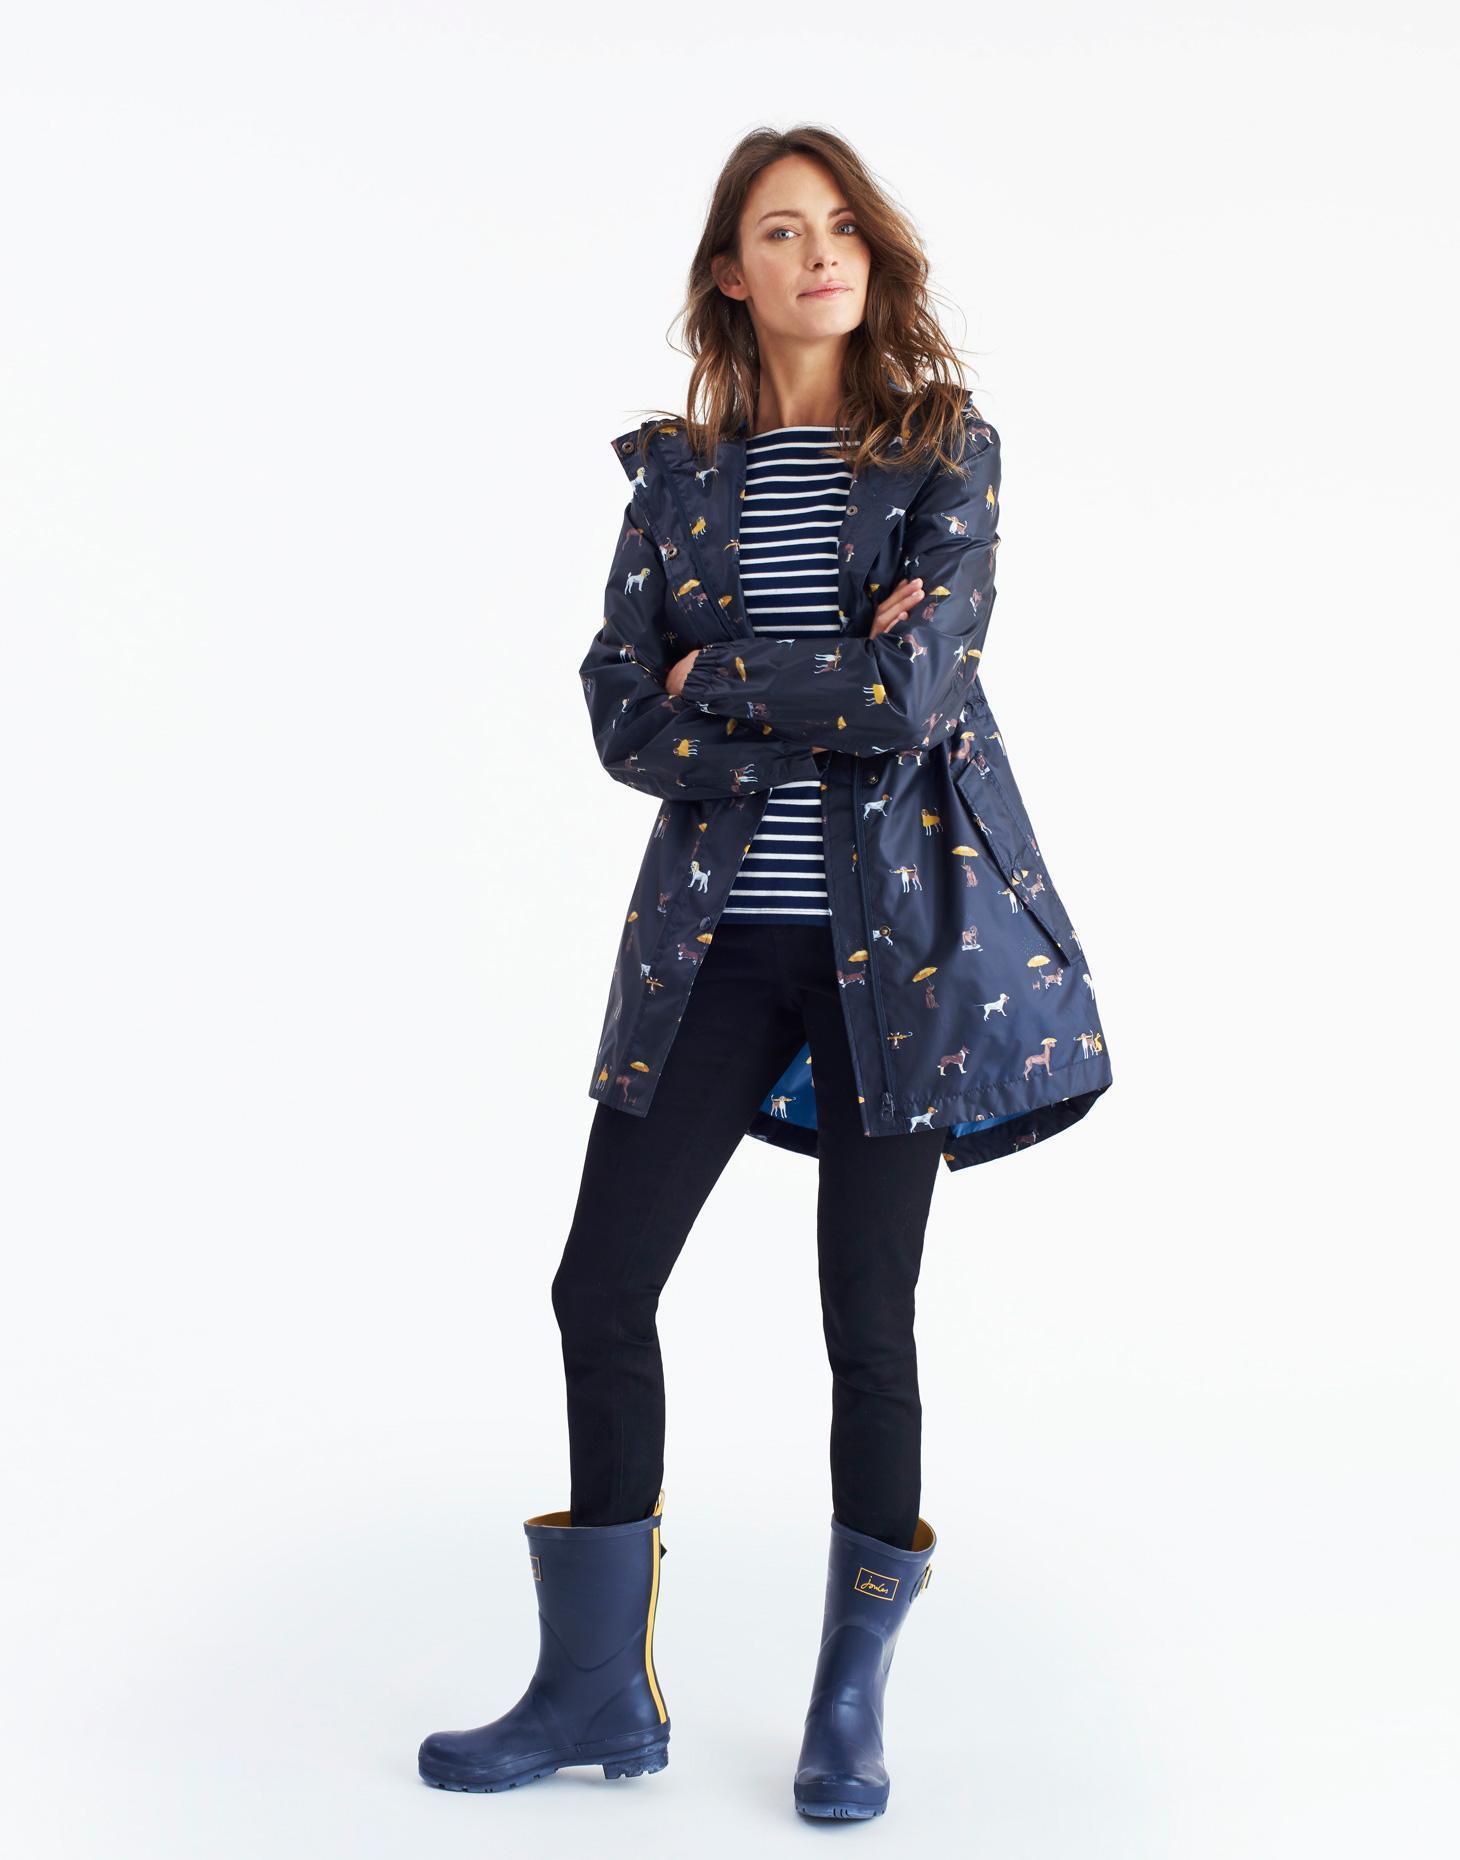 Joules GoLightly Navy Star Packaway Jacket Waterproof Mac Coat Women 8 New